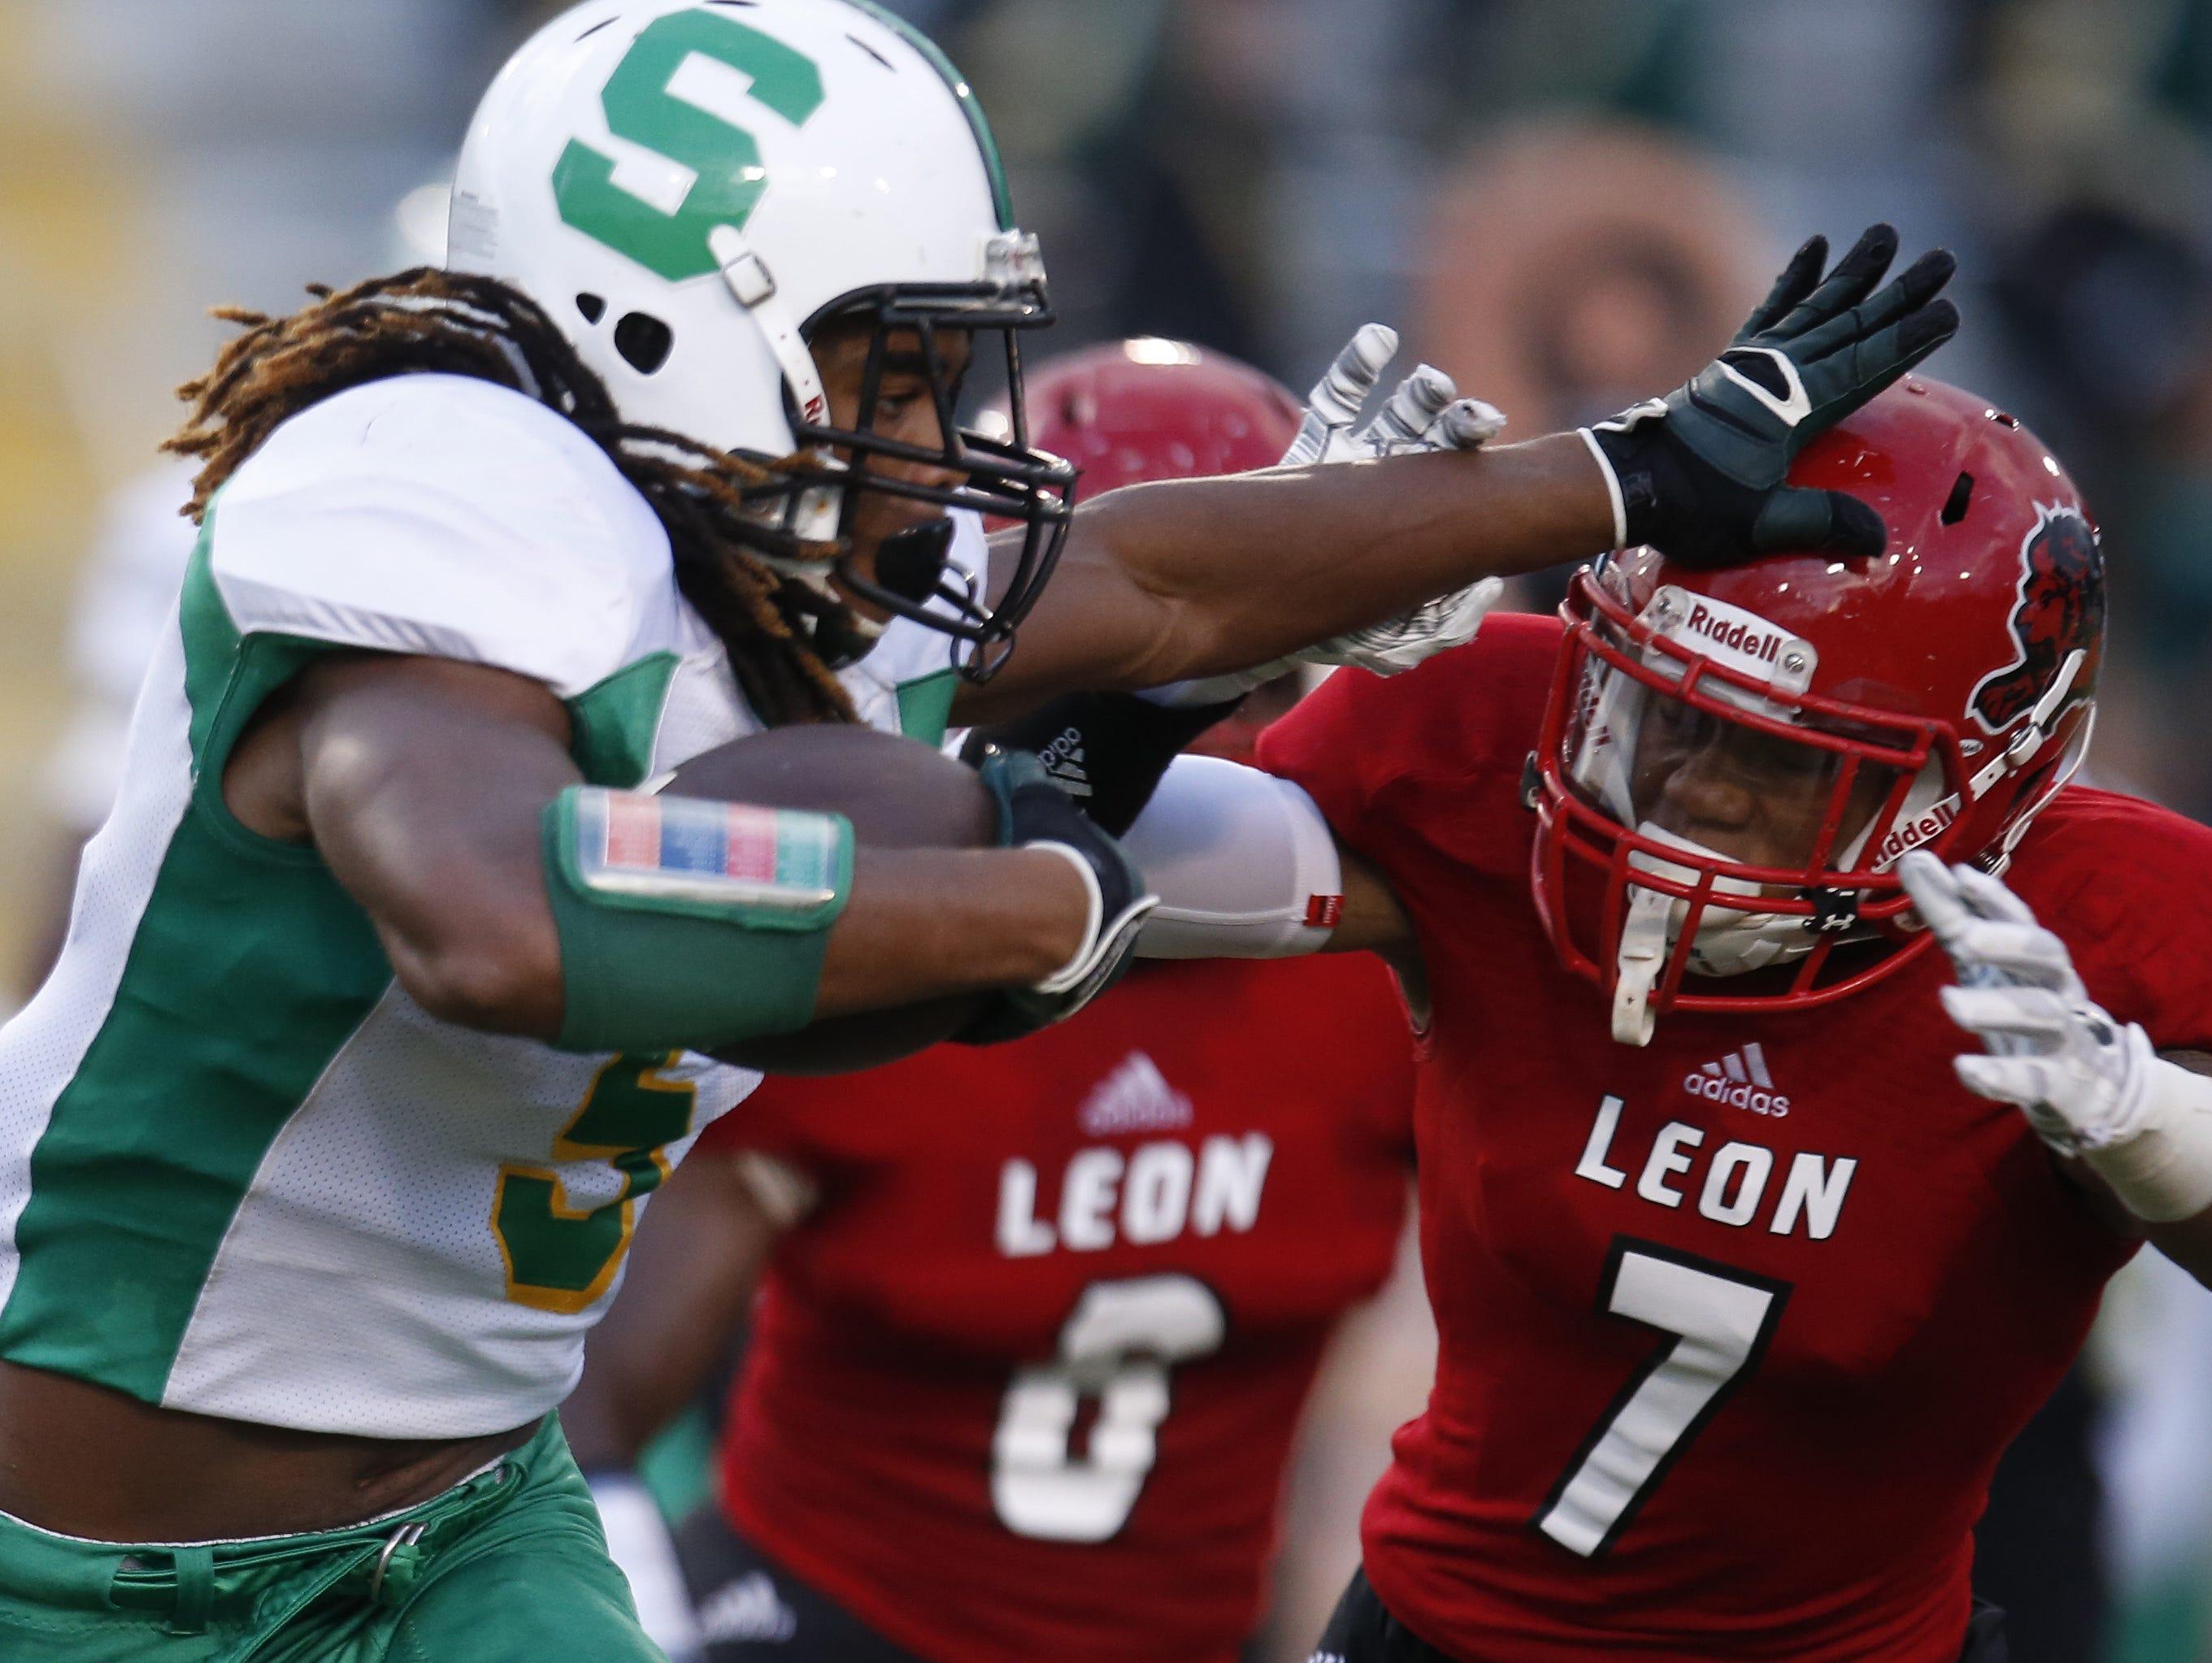 Suwannee's Aaron McAllister stiff arms Leon's Damien Crumitie during their game at Cox Stadium on Friday.